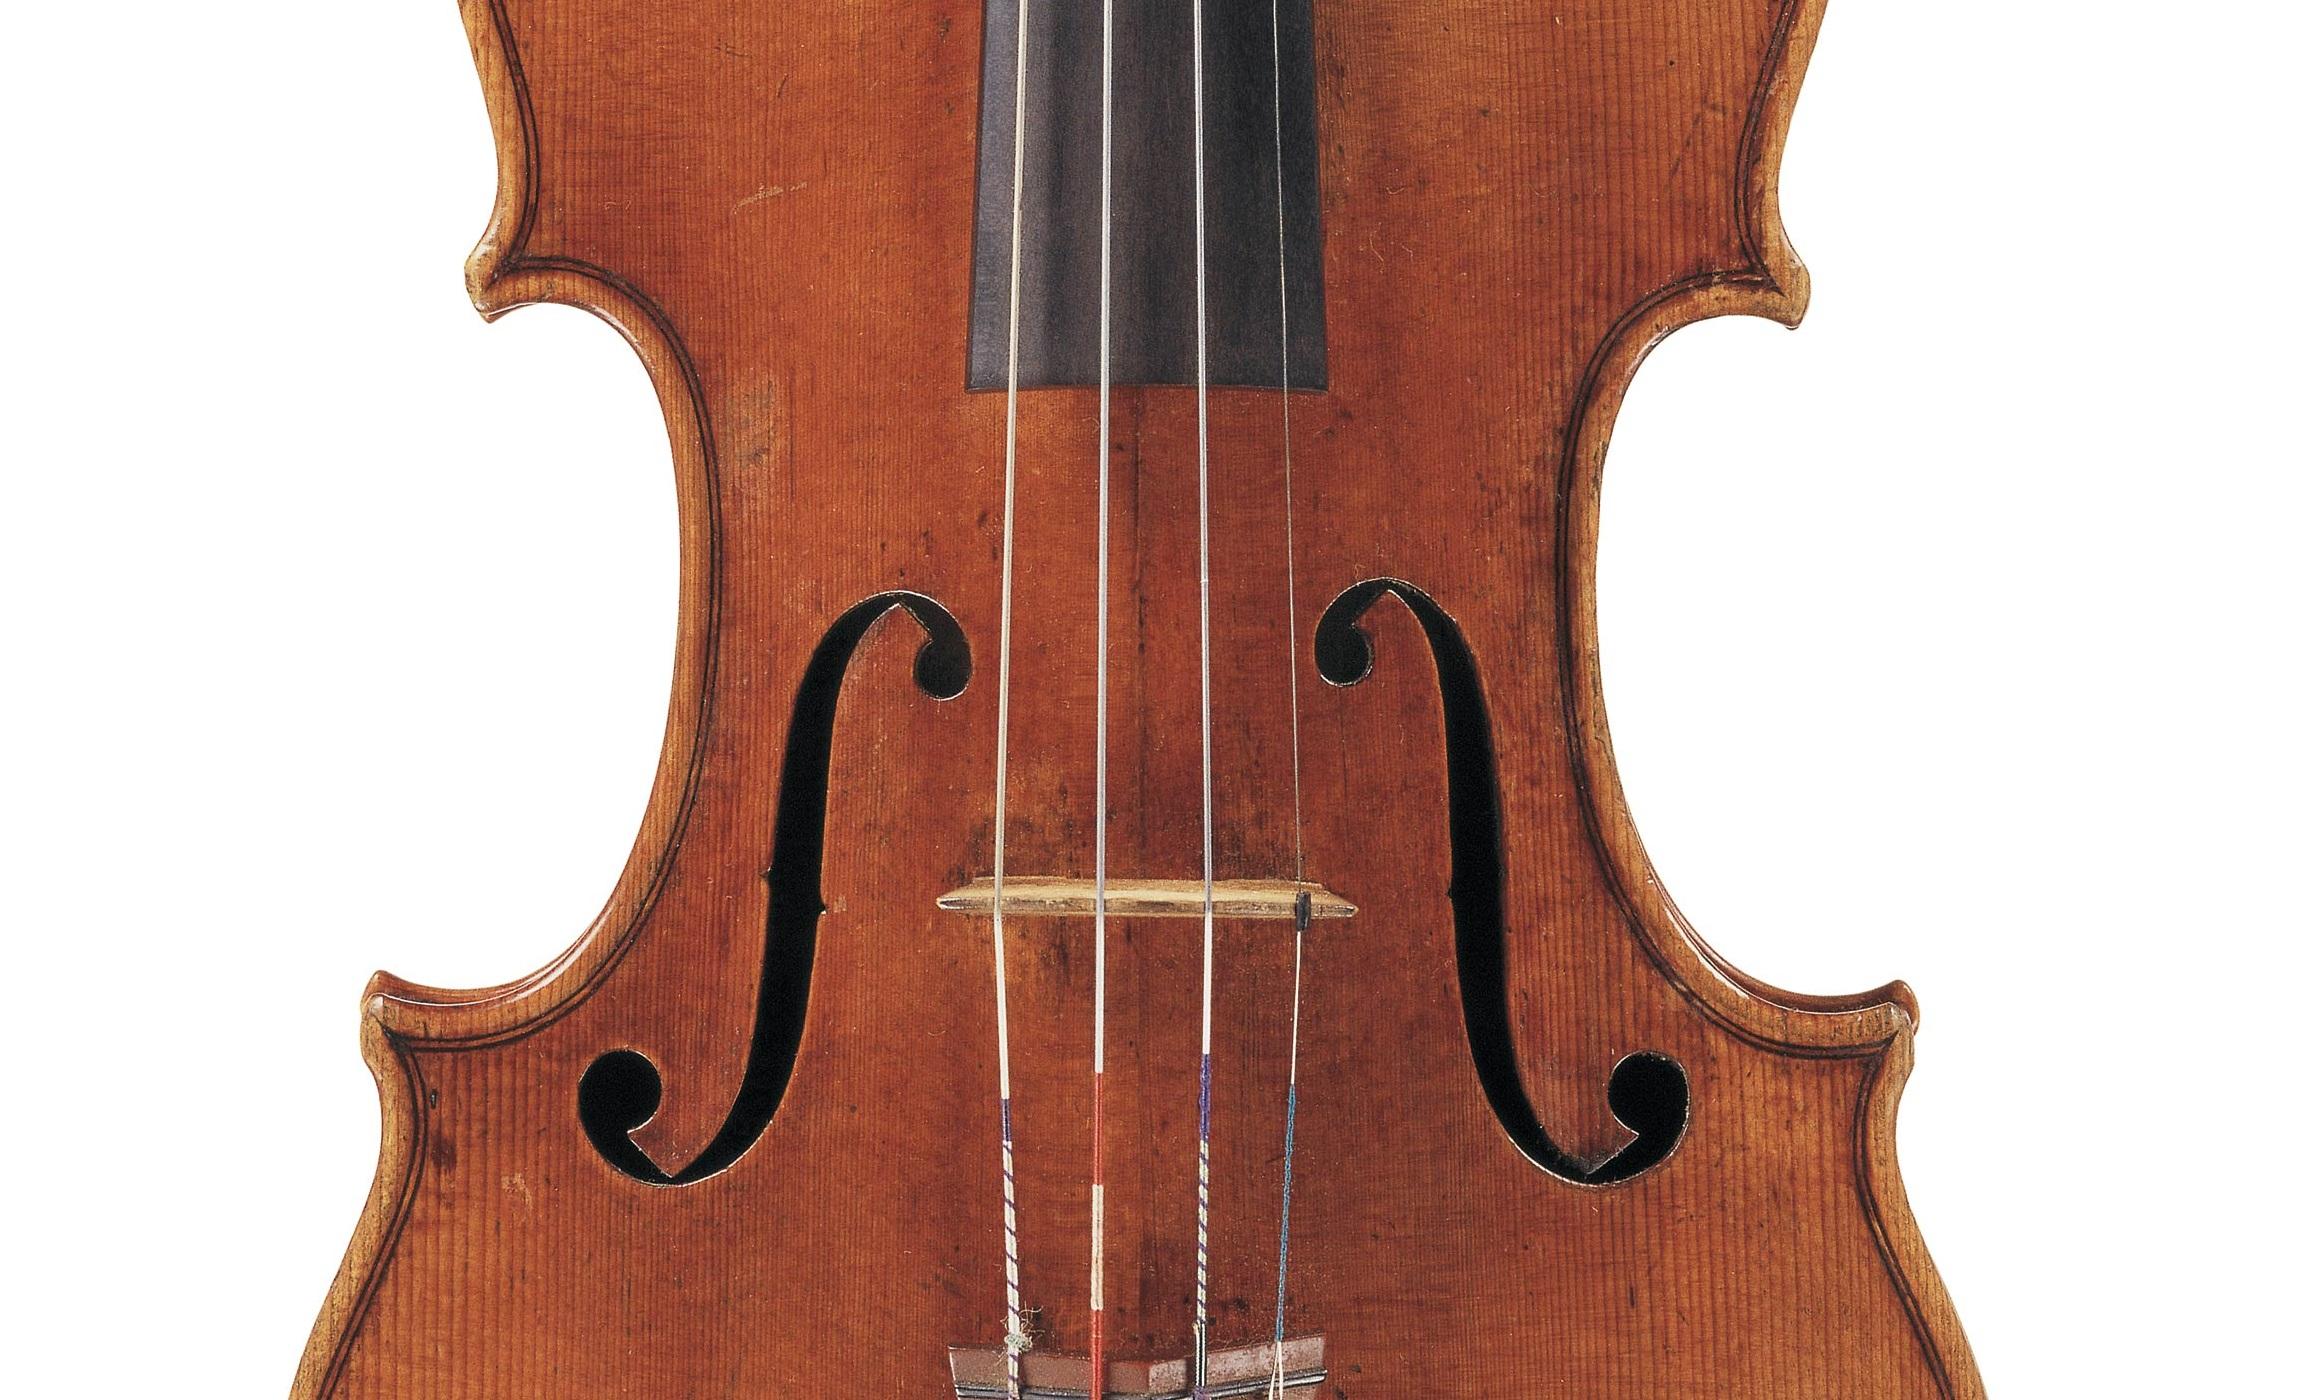 Front of the Dancla violin by Antonio Stradivari, Cremona, 1703